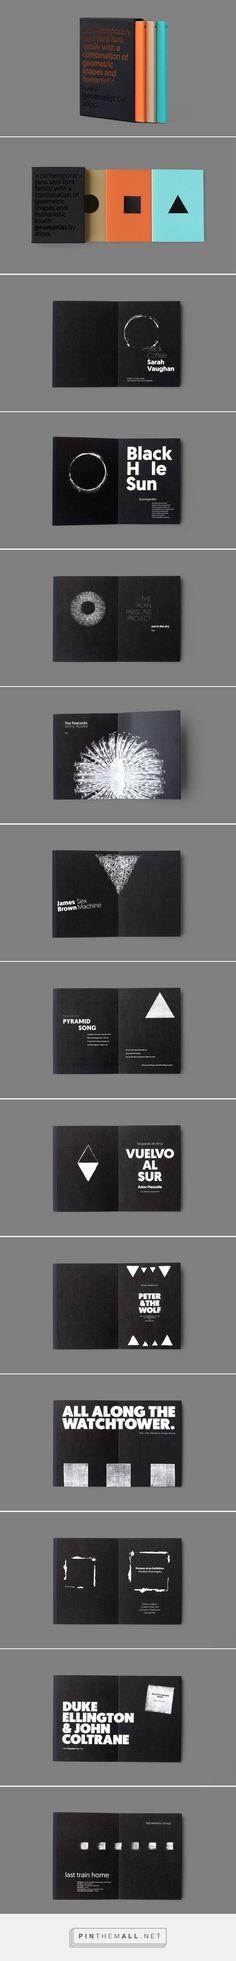 type specimen booklets collection - PPT design ideas